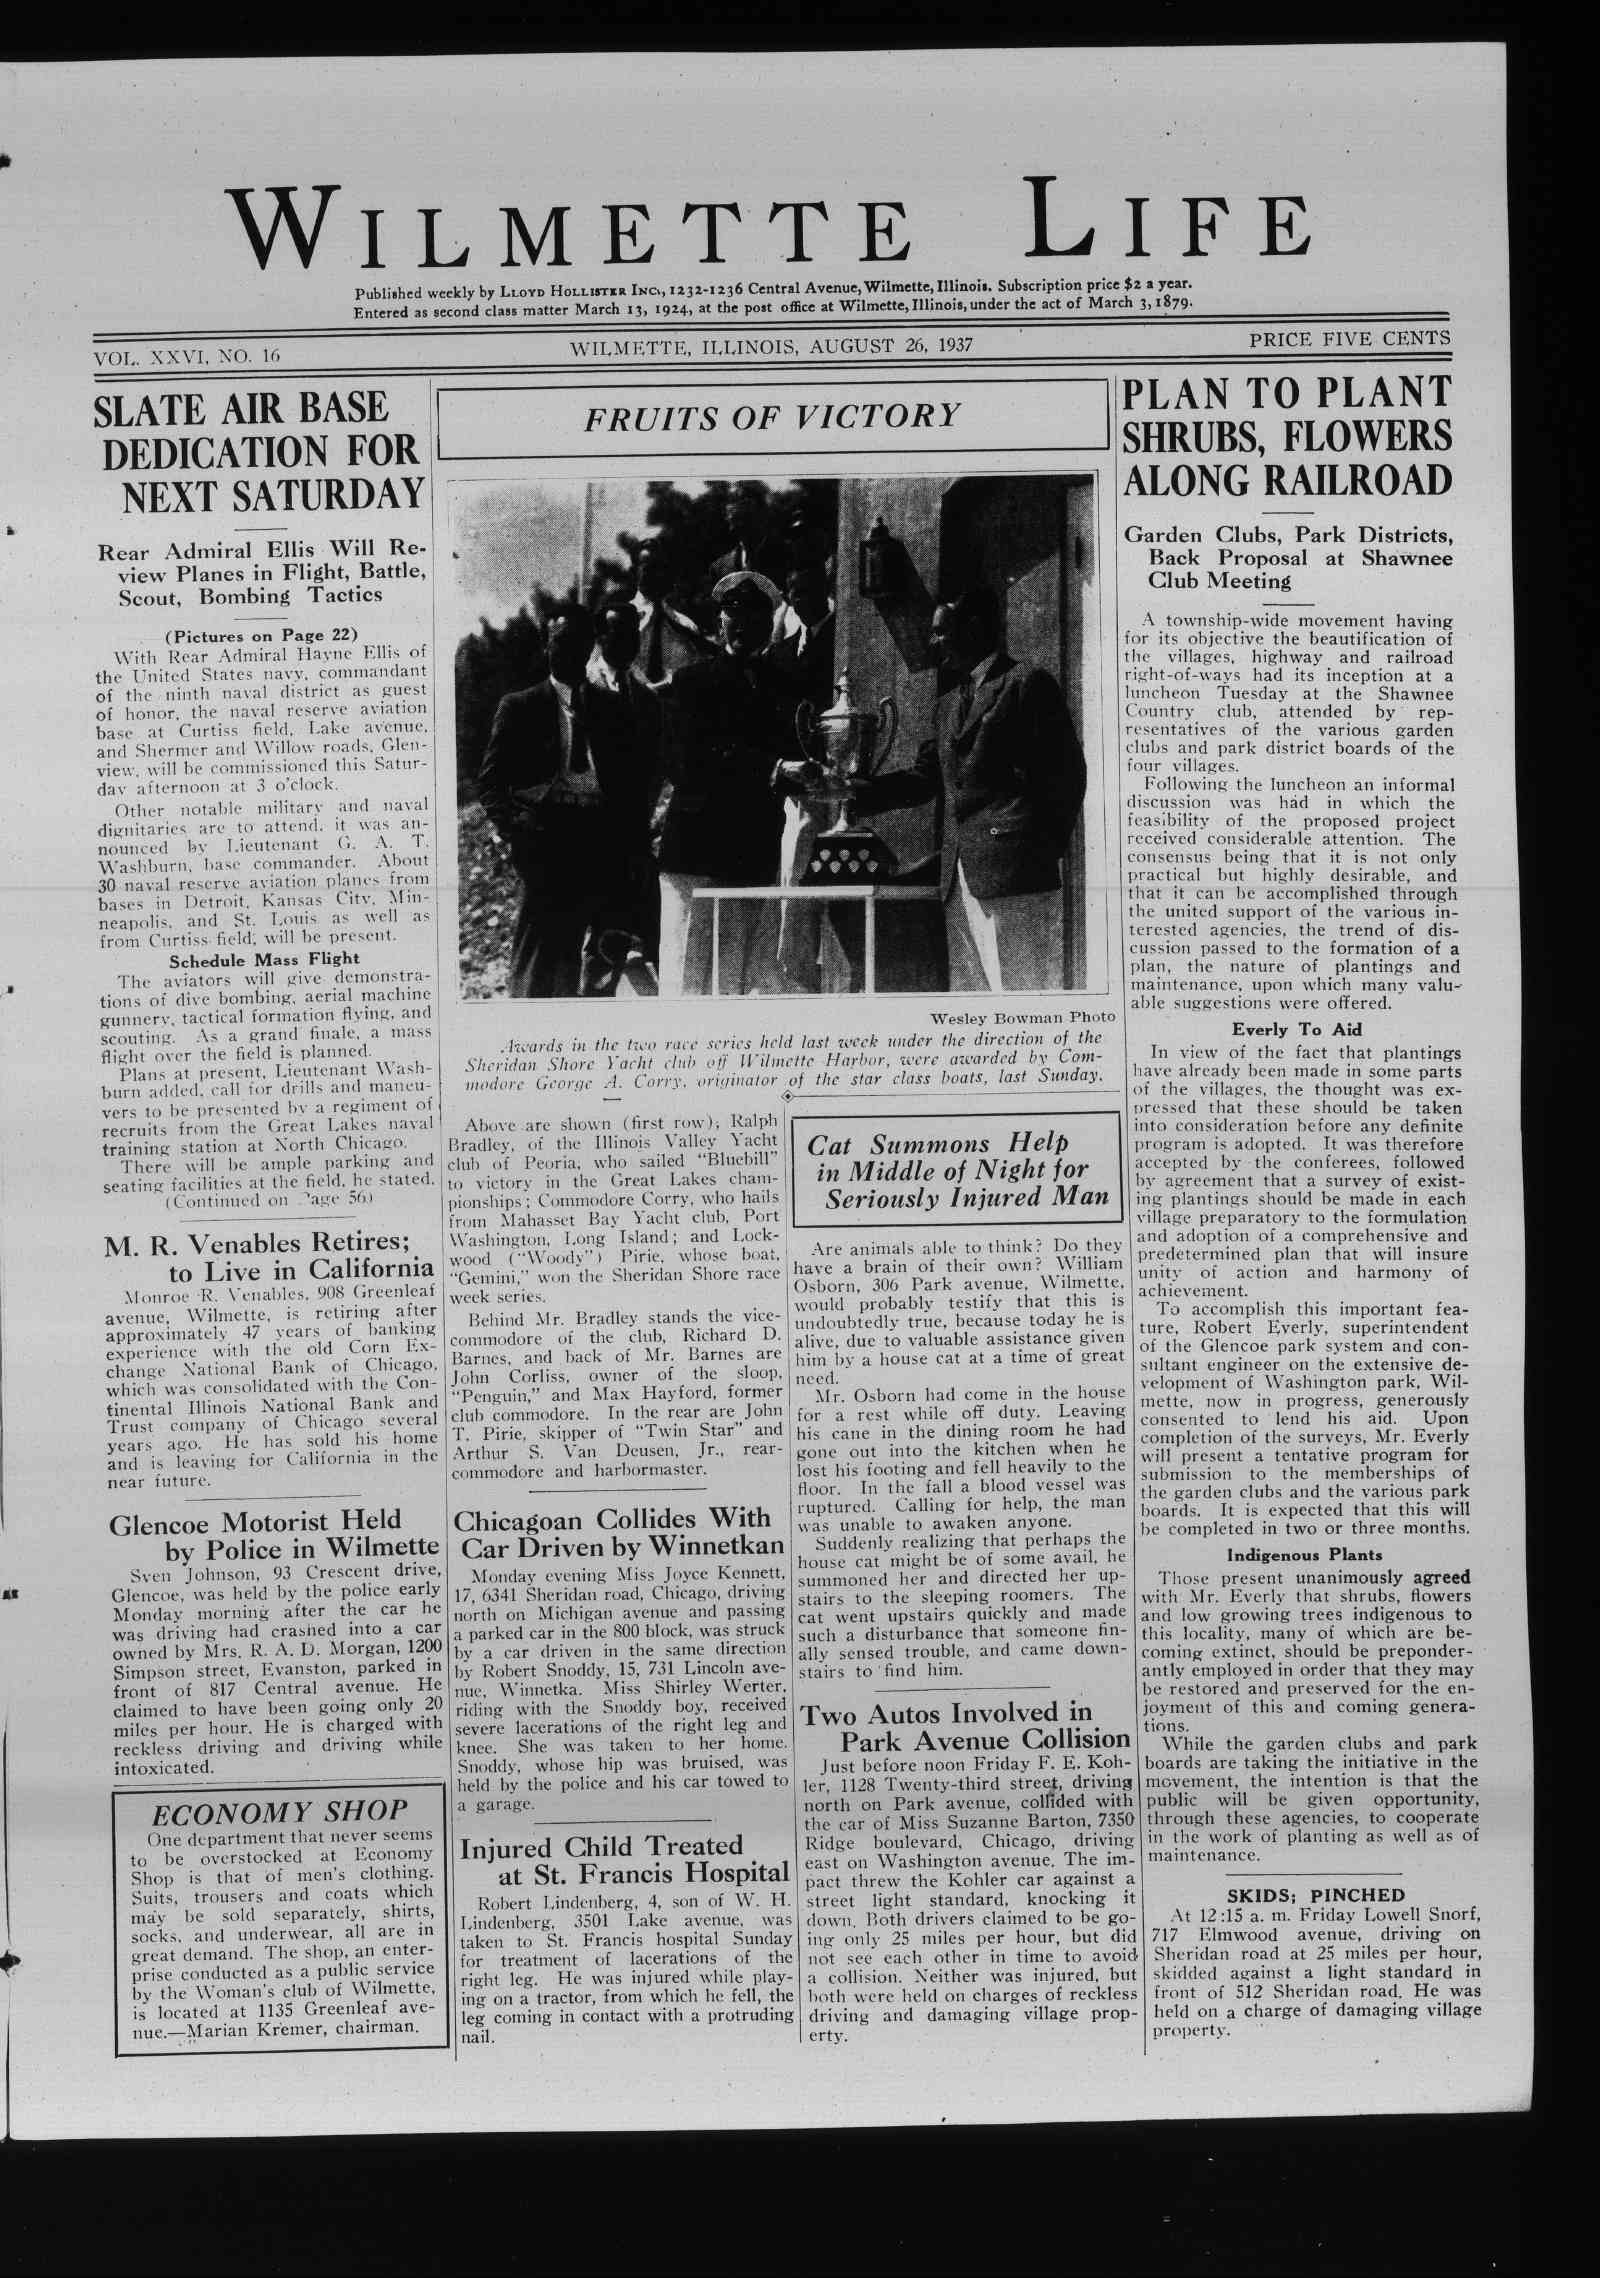 Wilmette Life (Wilmette, Illinois), 26 Aug 1937